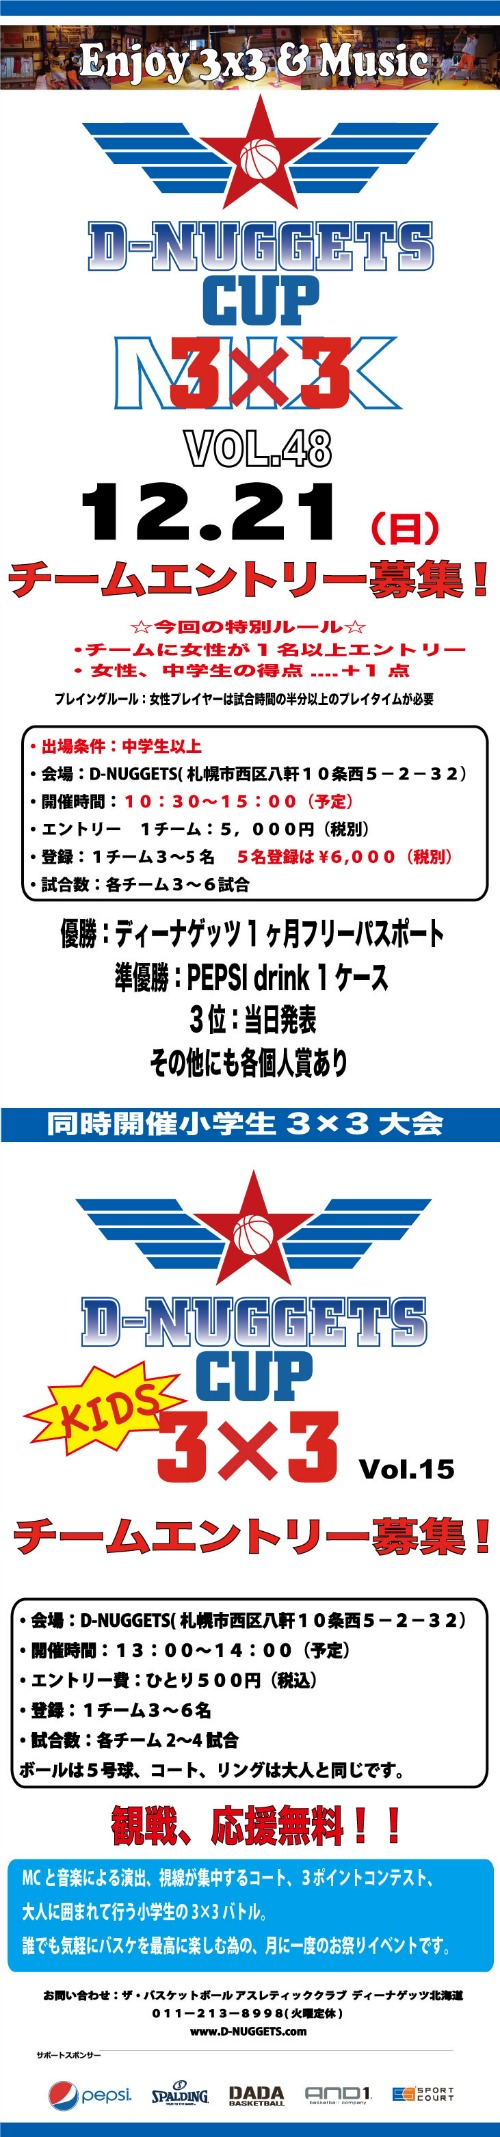 D-NUGGETS-CUP-HOKKAIDO-Vol.48.jpg